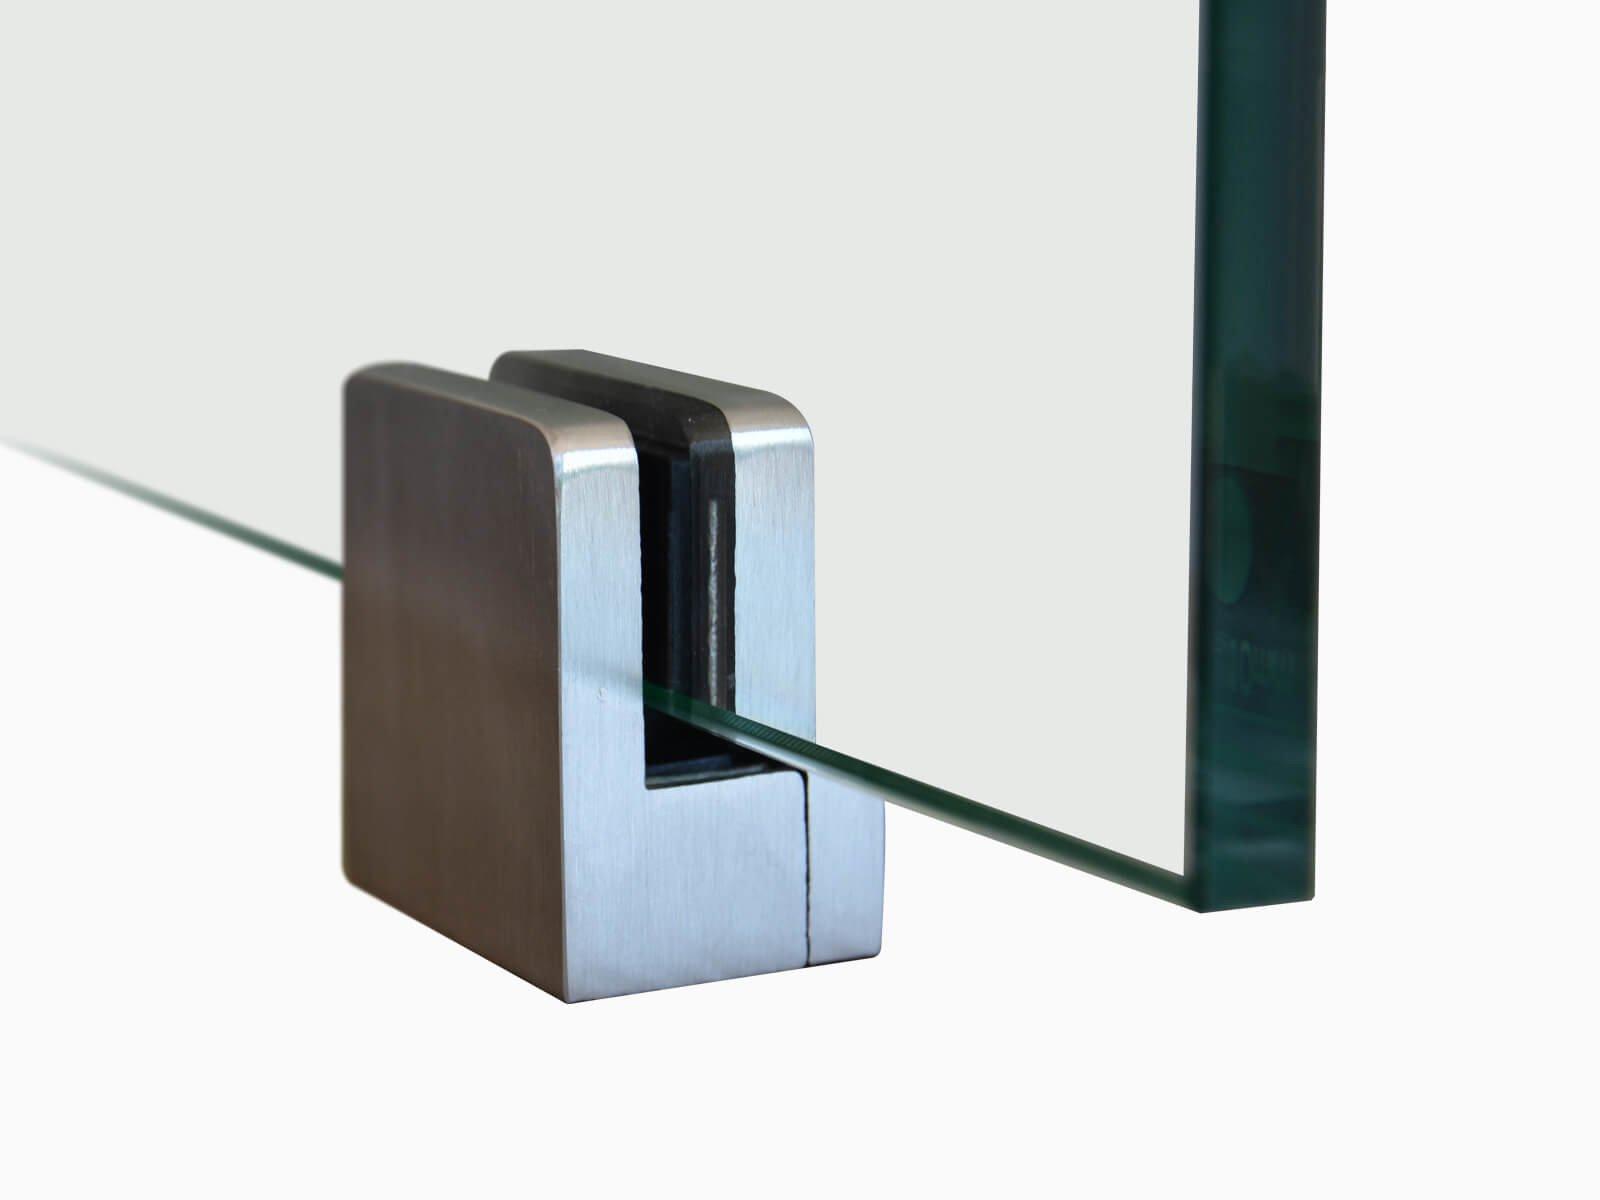 Trennwand Glas Klemme Serie PUR 10 mm